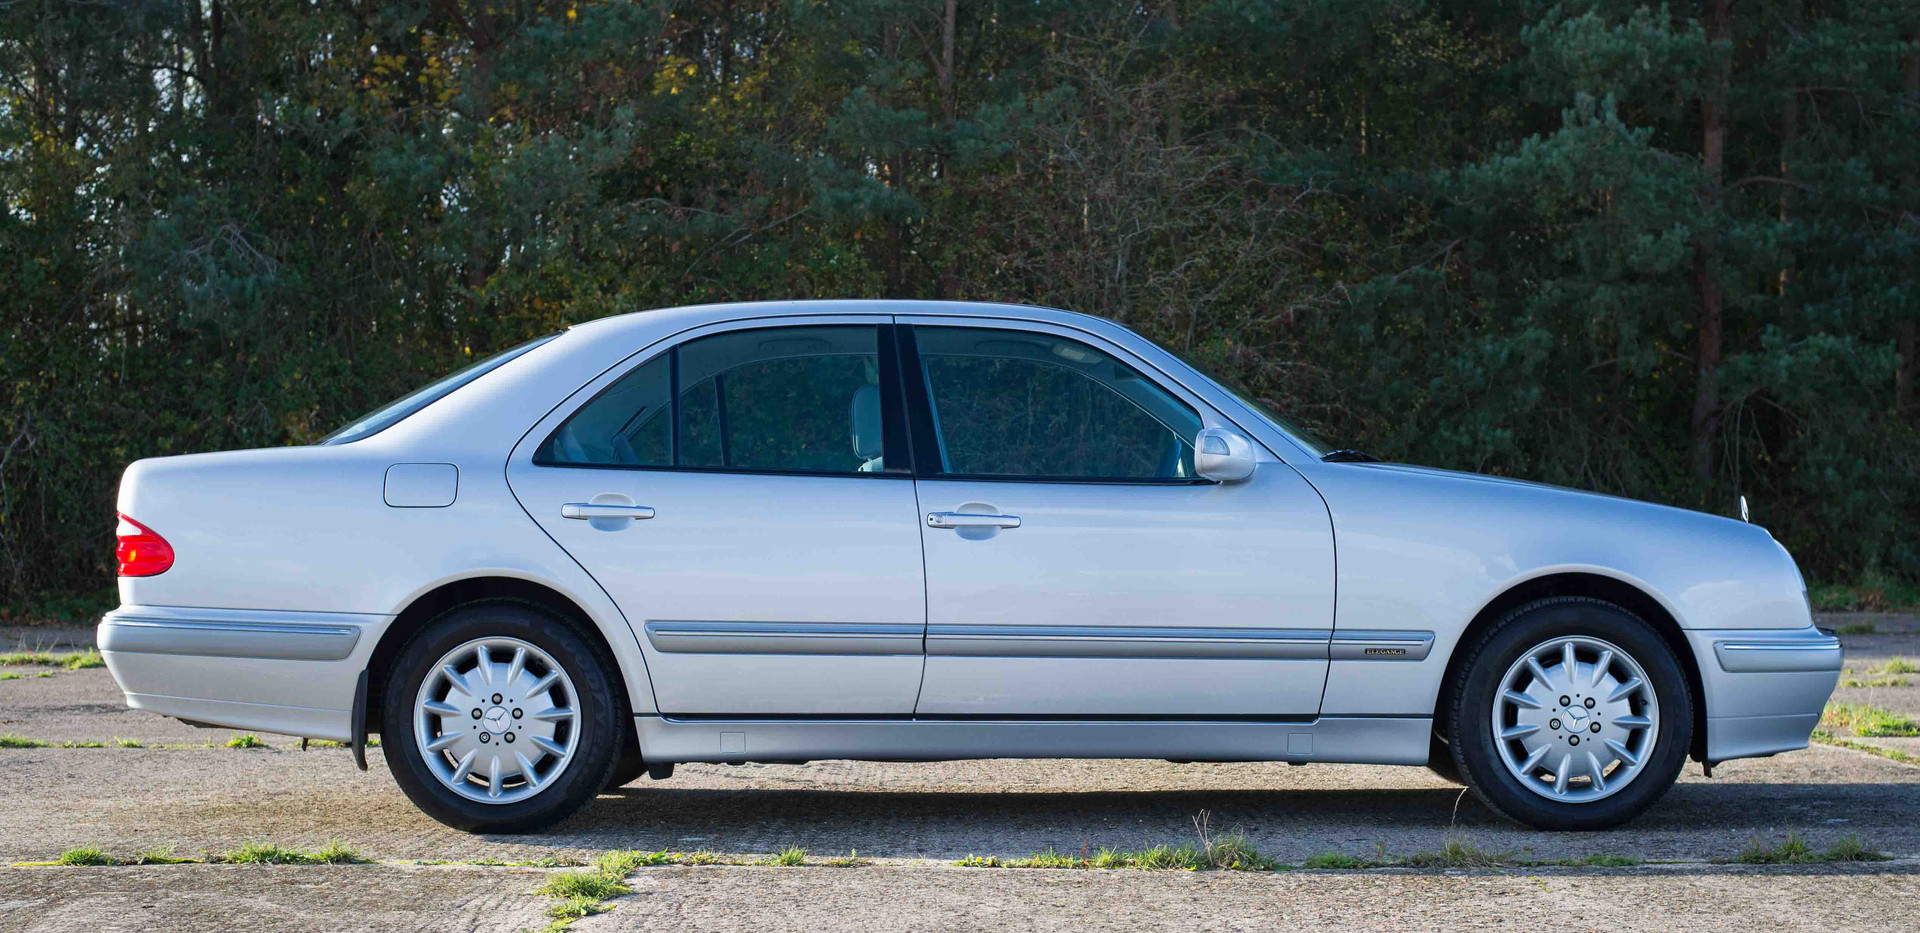 Mercedes E240 For Sale UK London  (10 of